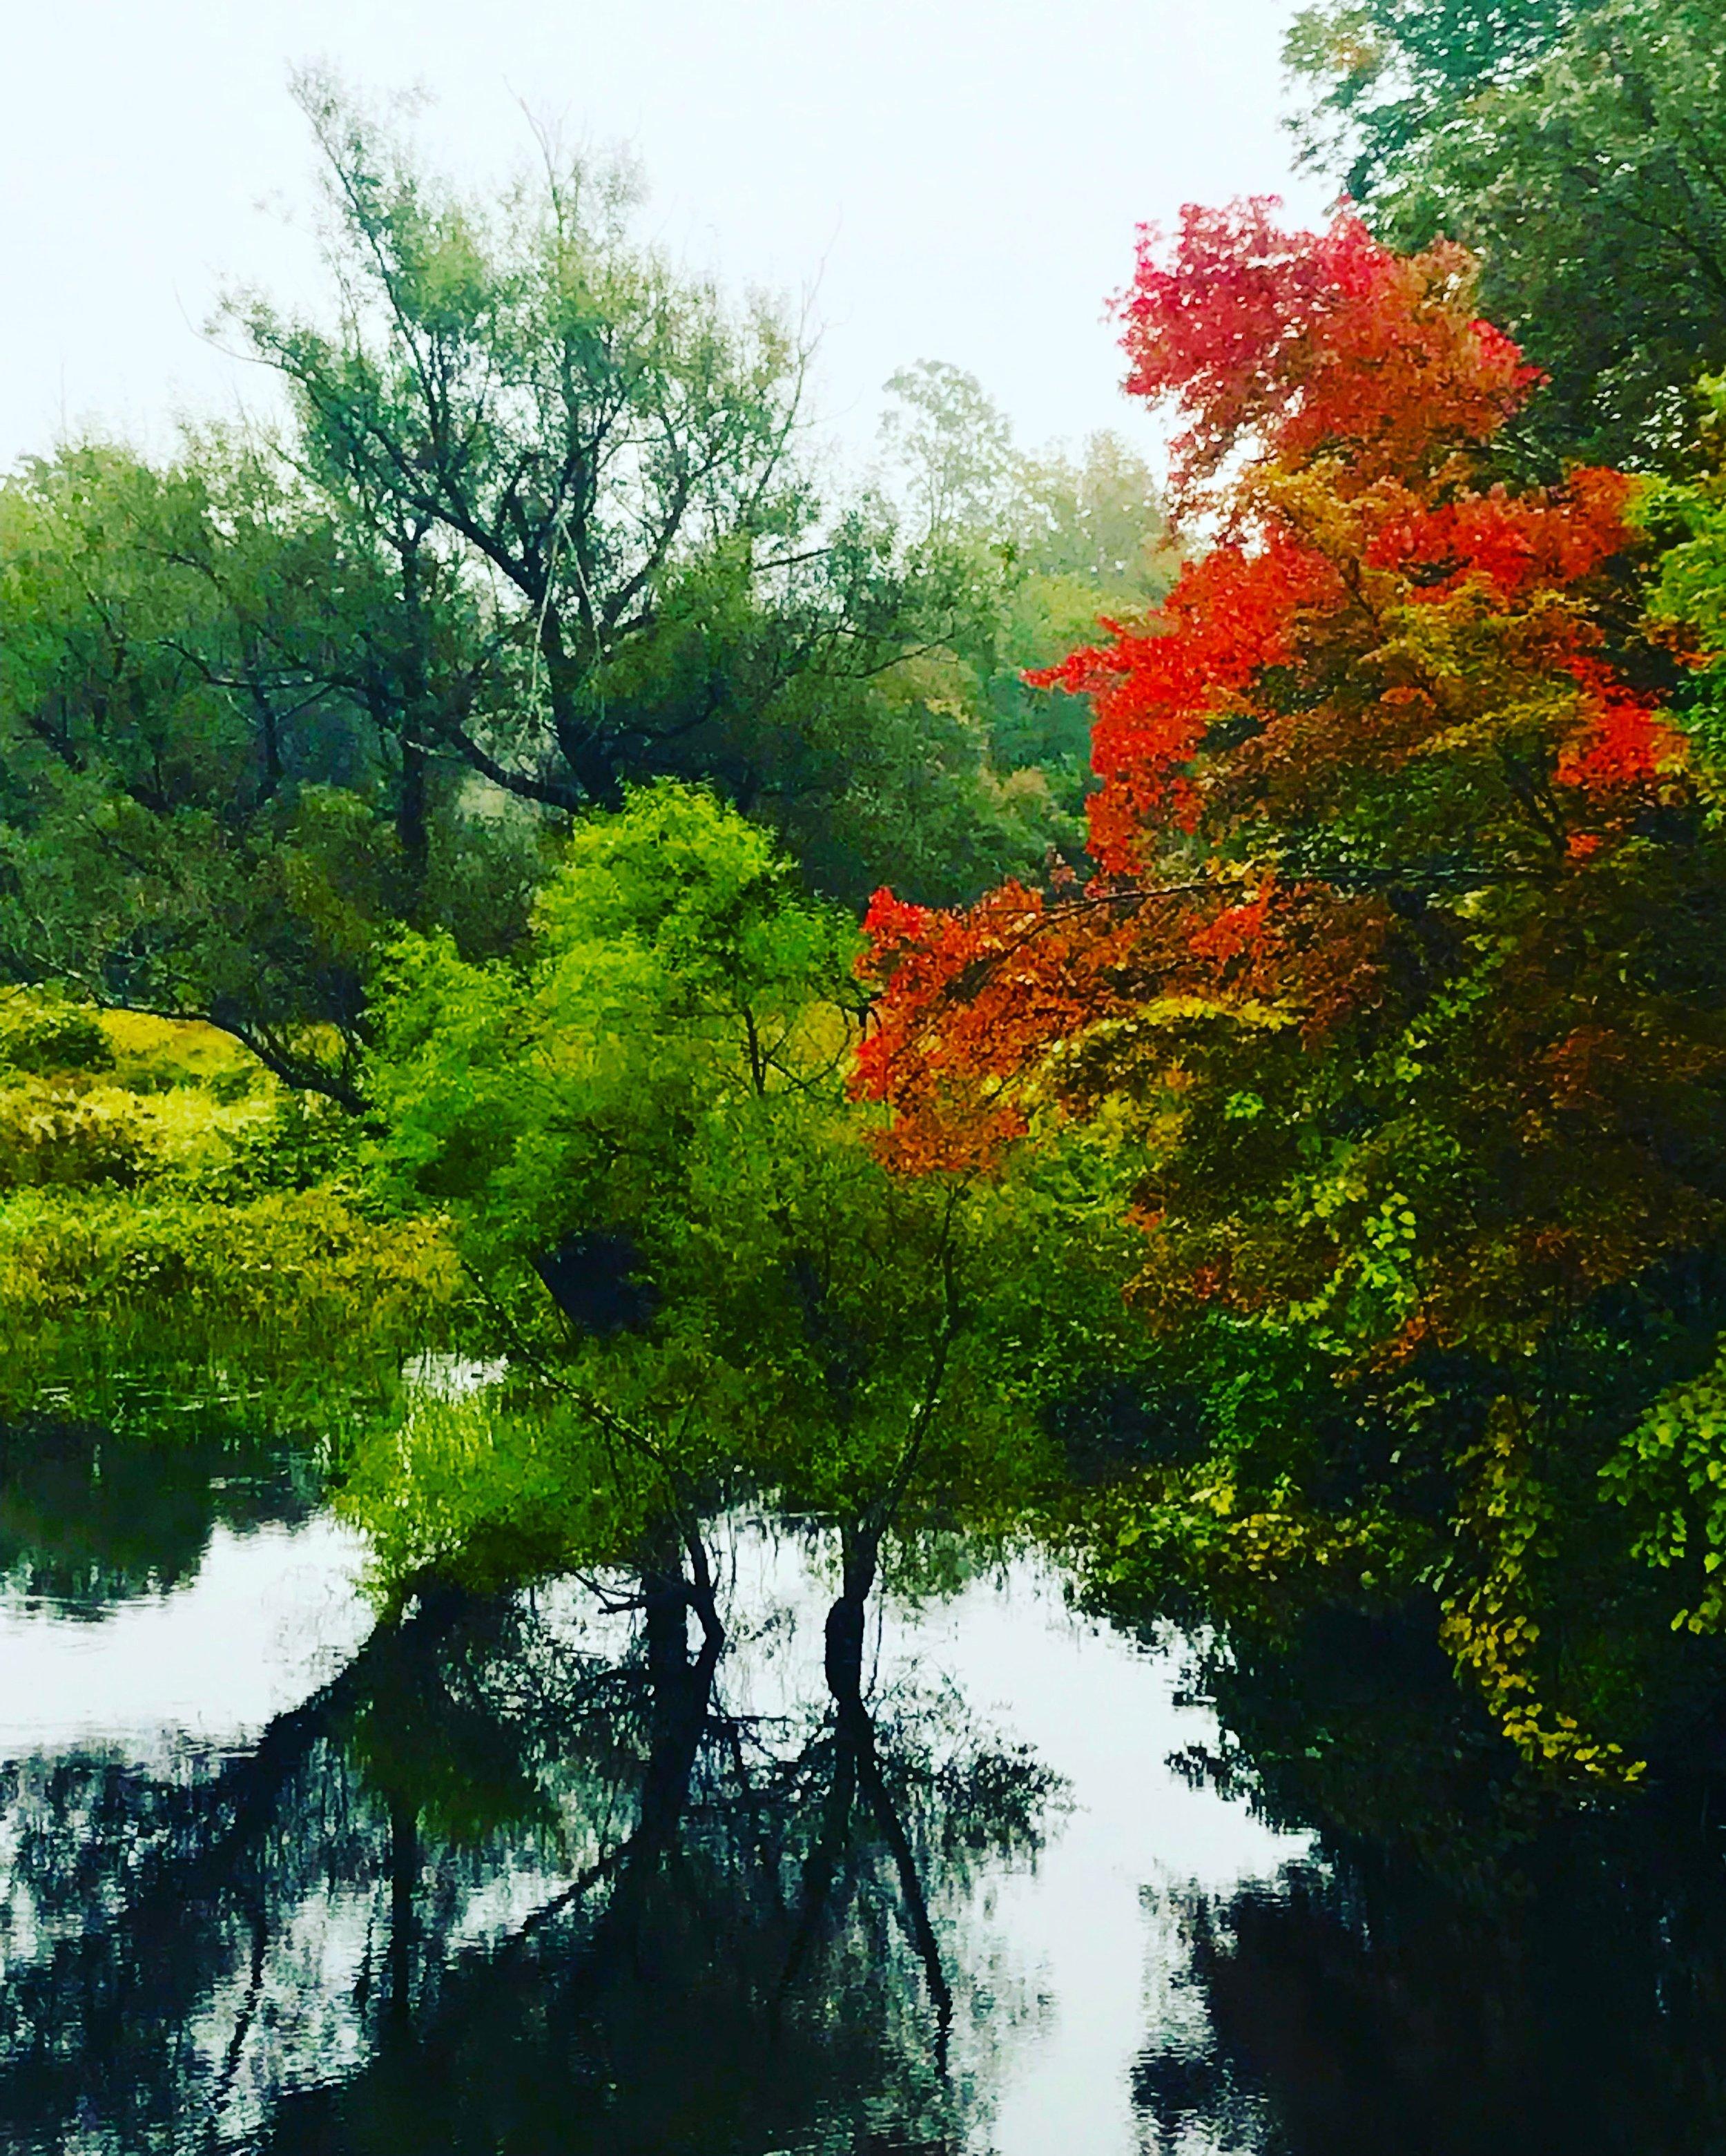 Charles River morning view